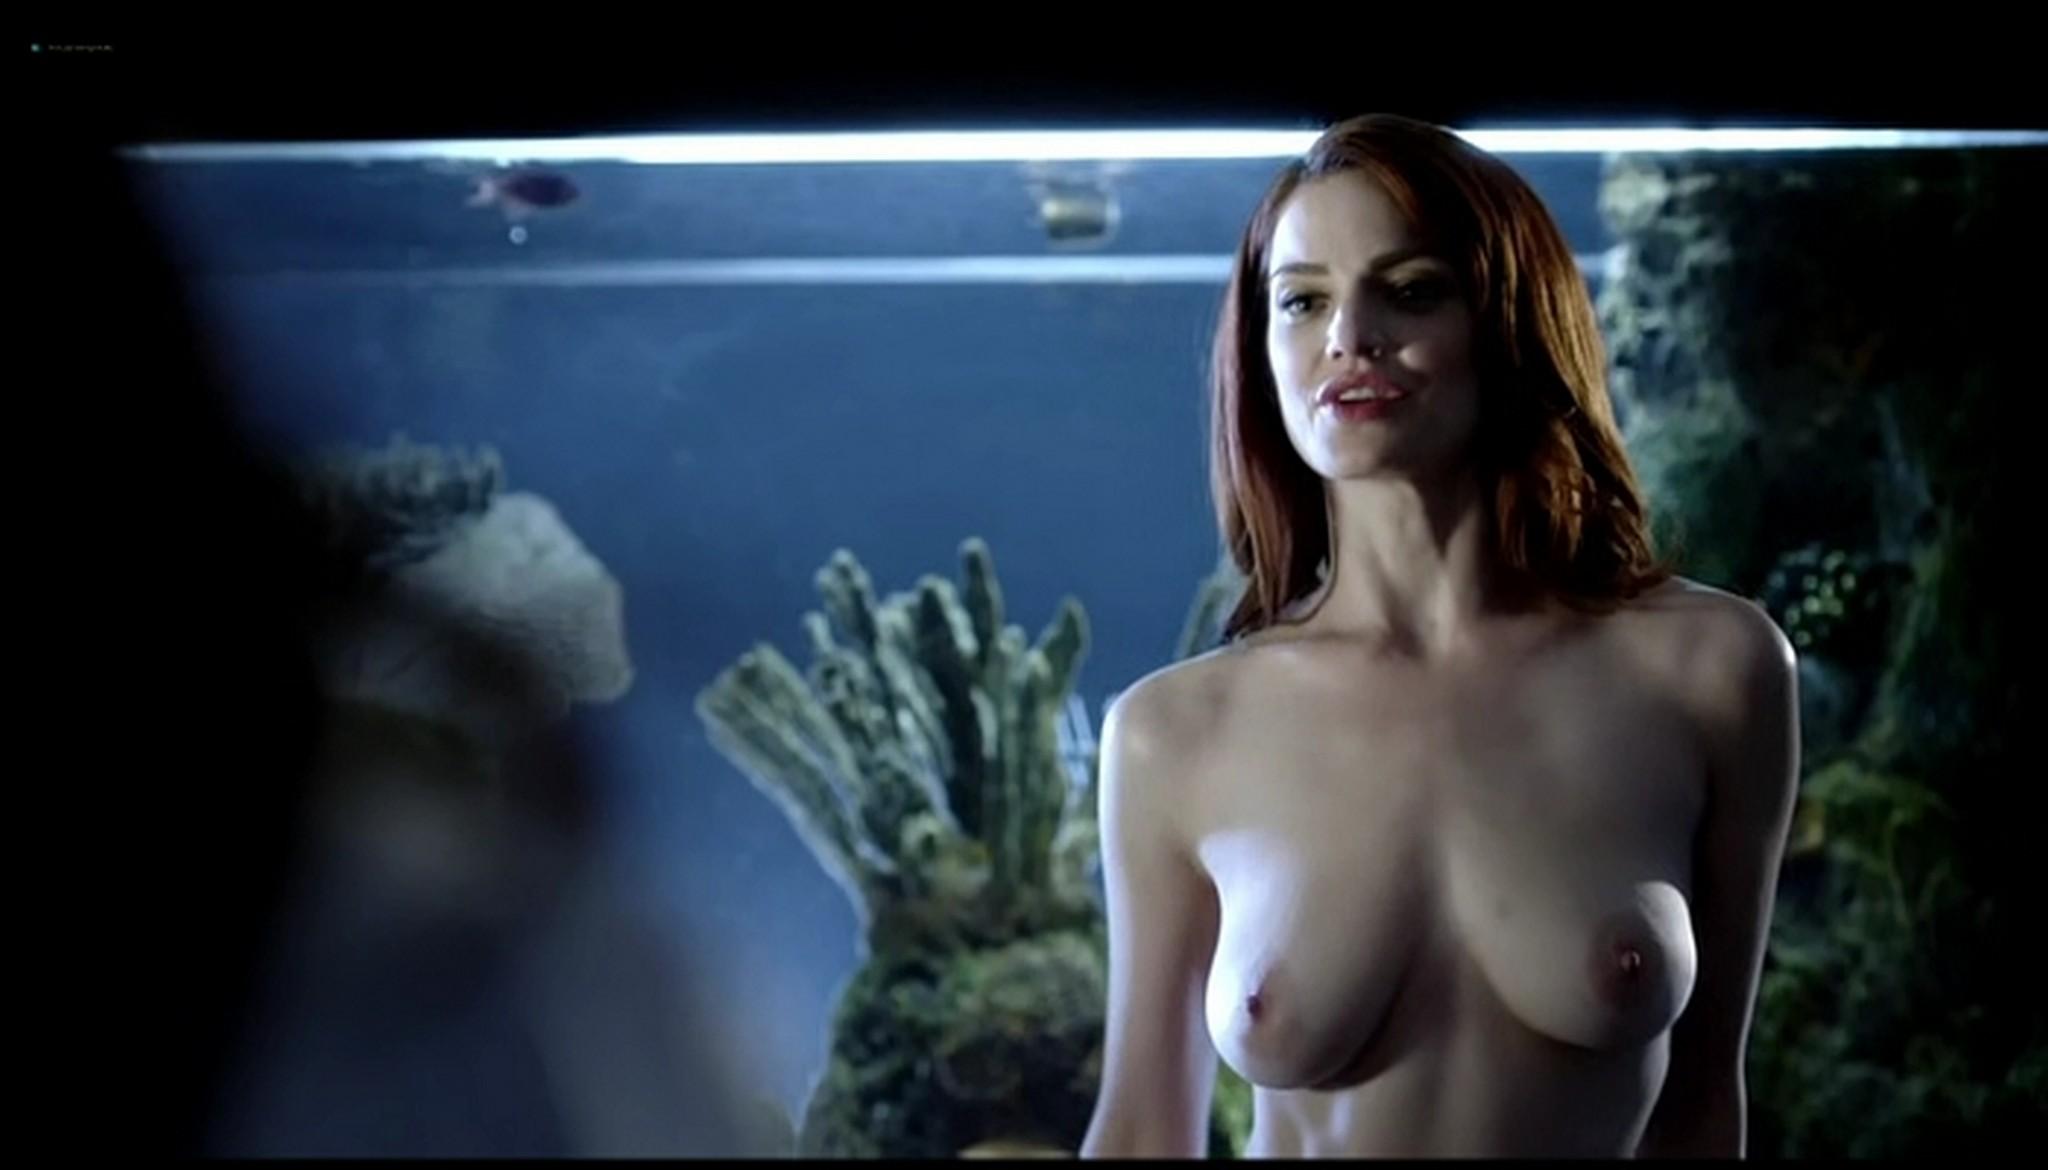 Diana Gettinger nude sex Moniqua Plante nude lesbian - Femme Fatales (2012) s2e2 - Gun Twisted (5)